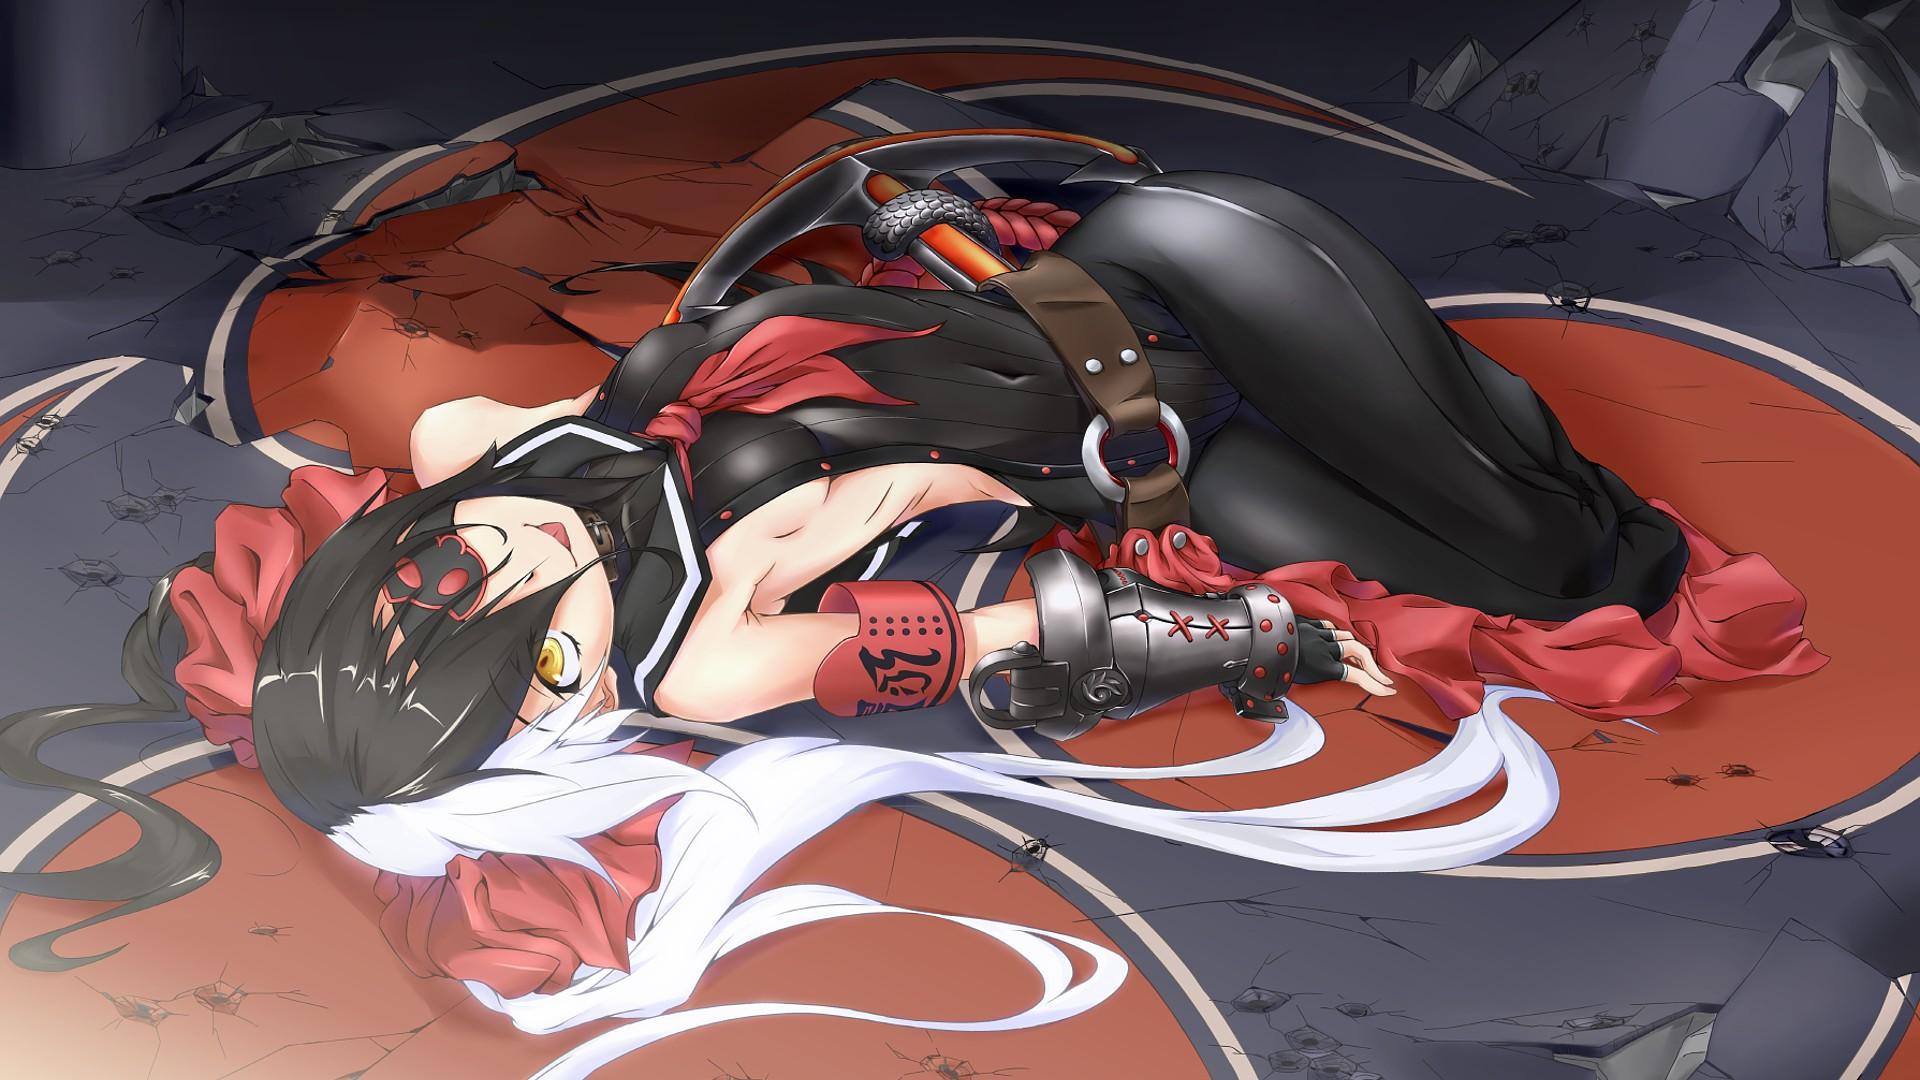 Anime porn sex mobile demon porn scene